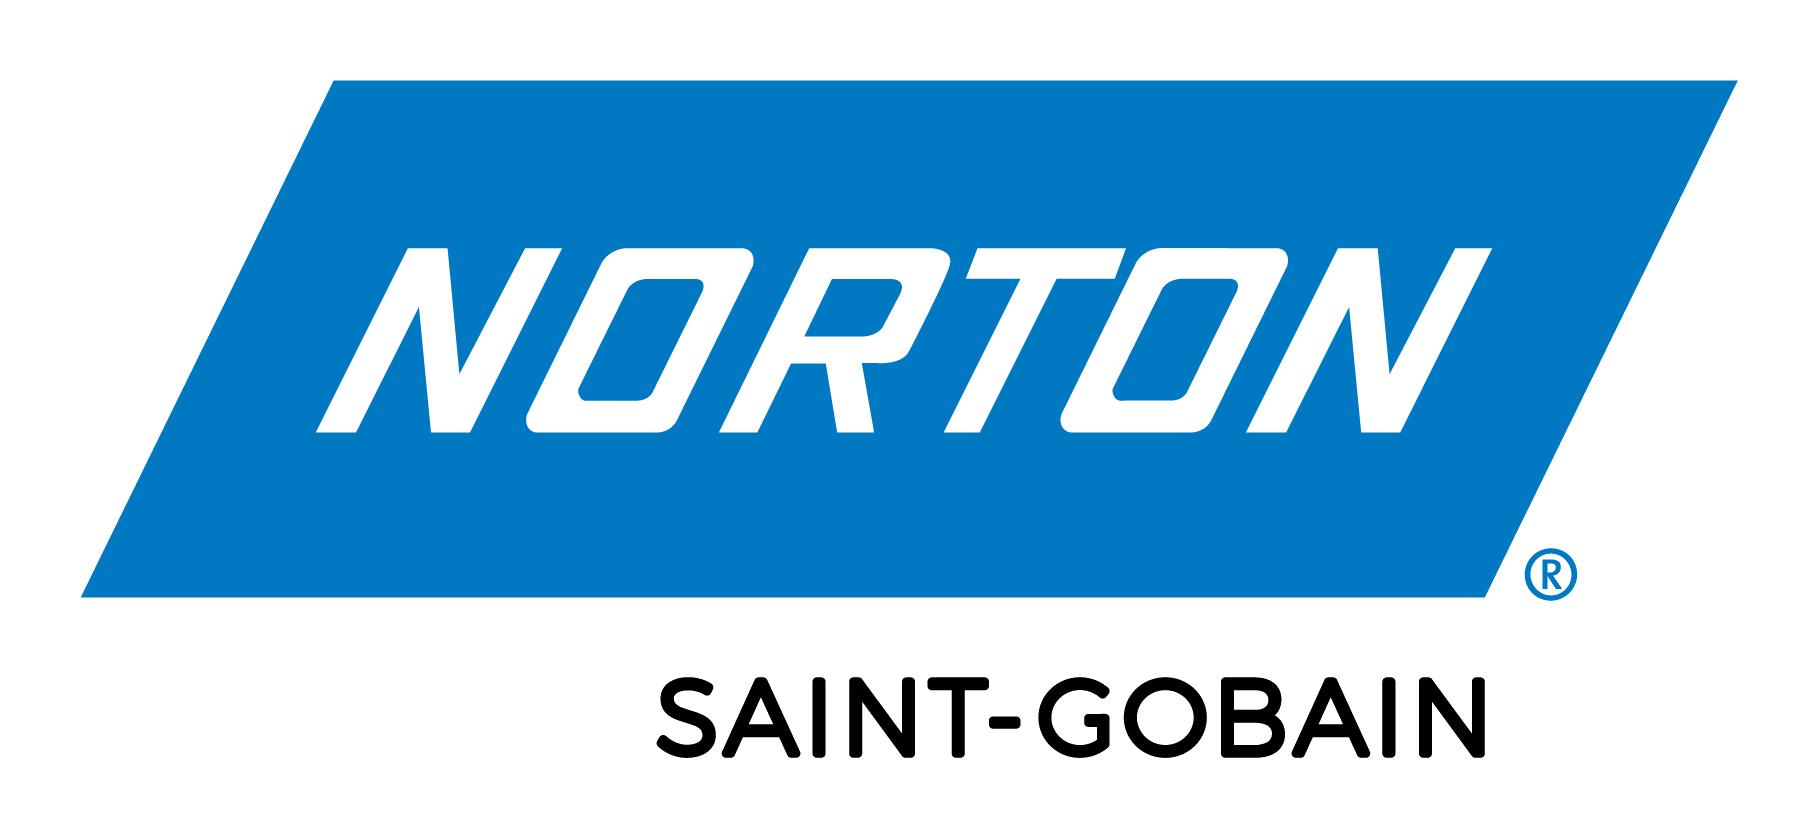 SG_Norton_logo_rgb_3